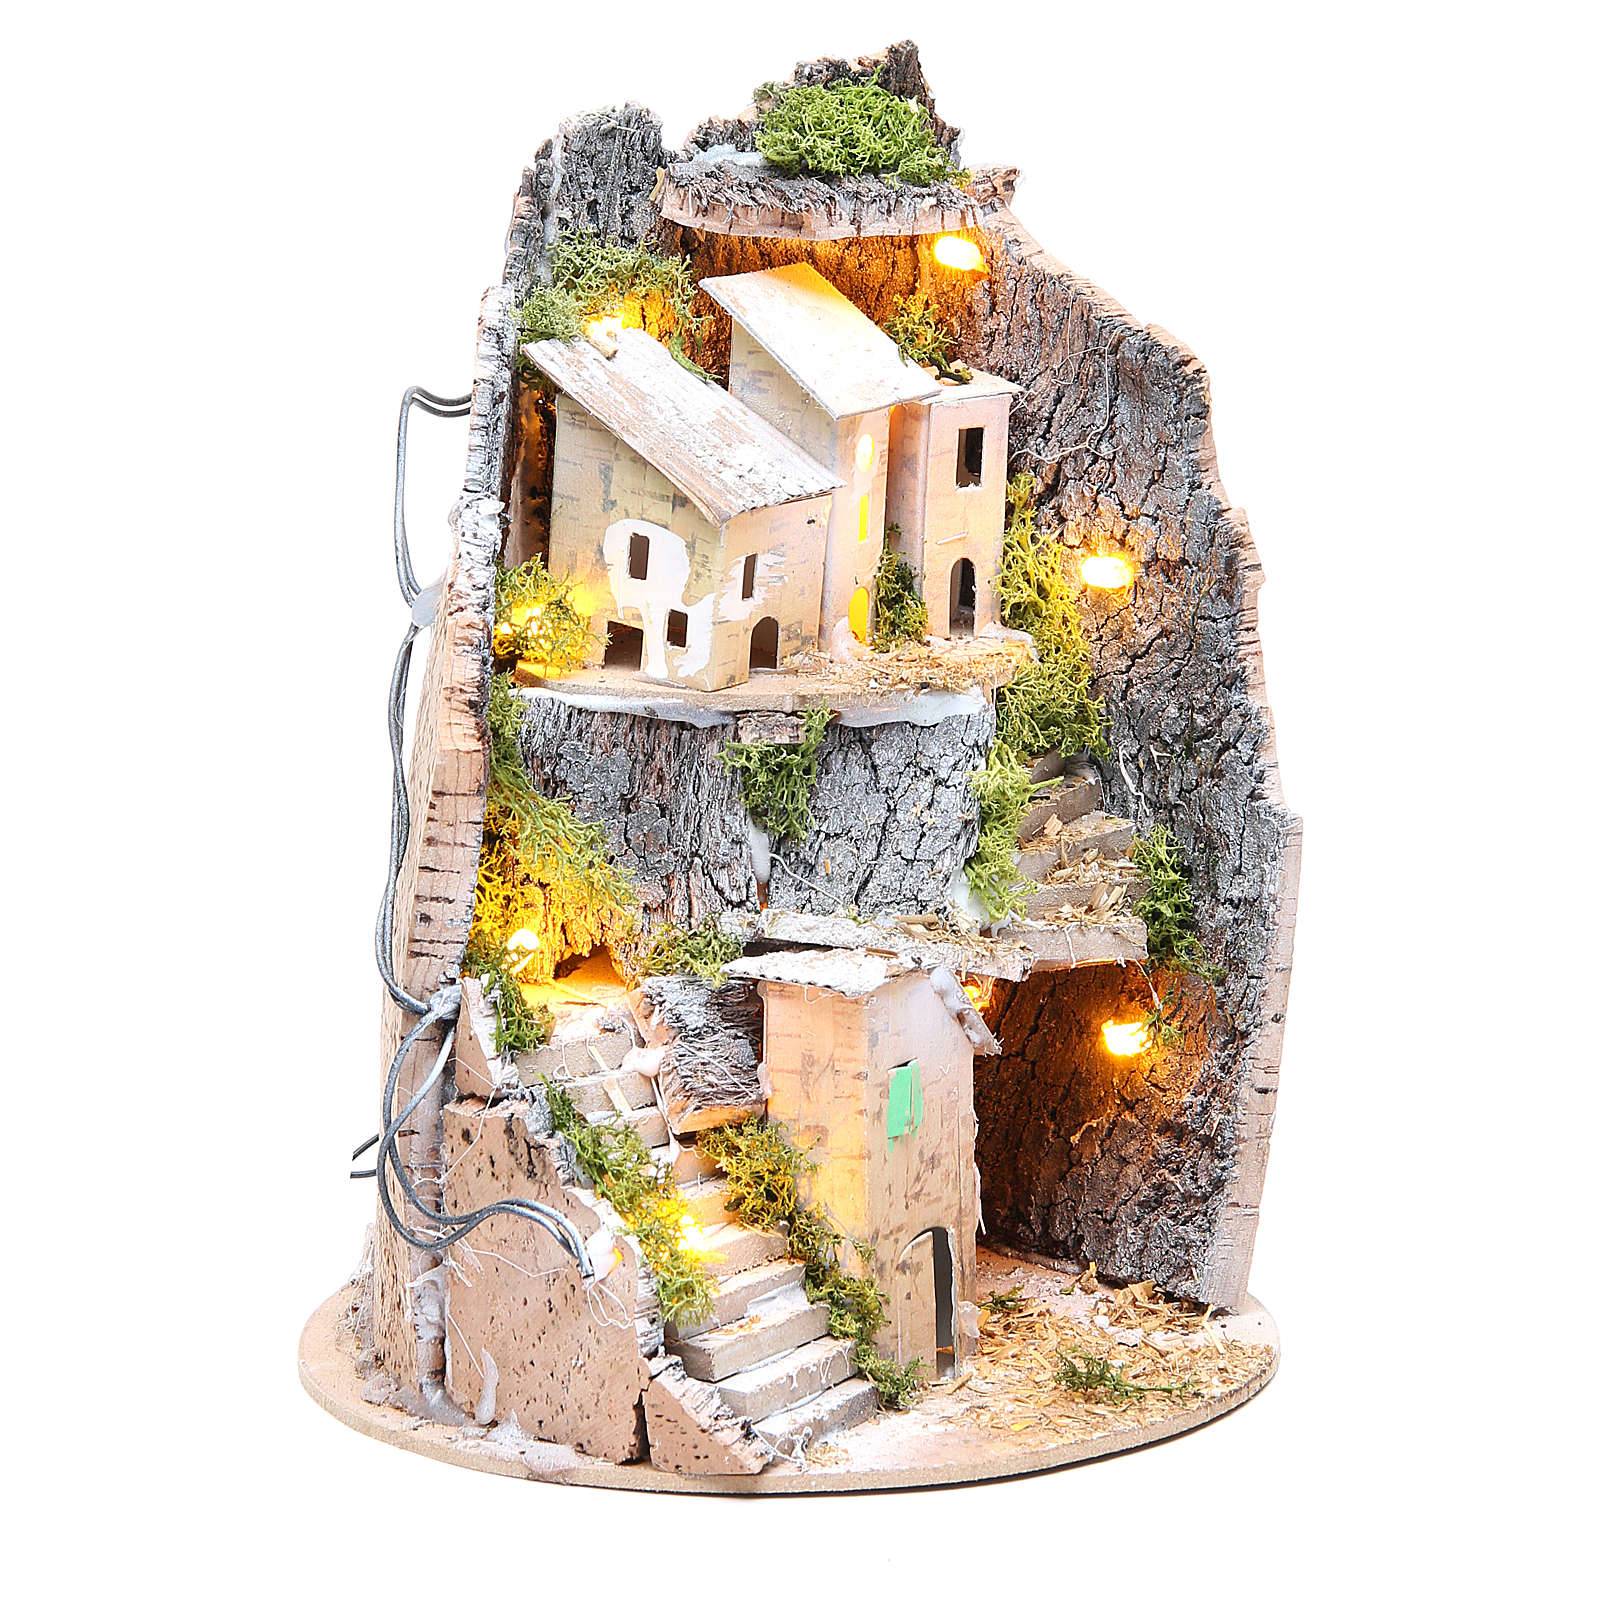 Borgo grotta presepe semitondo 10 luci 24x18 cm 4